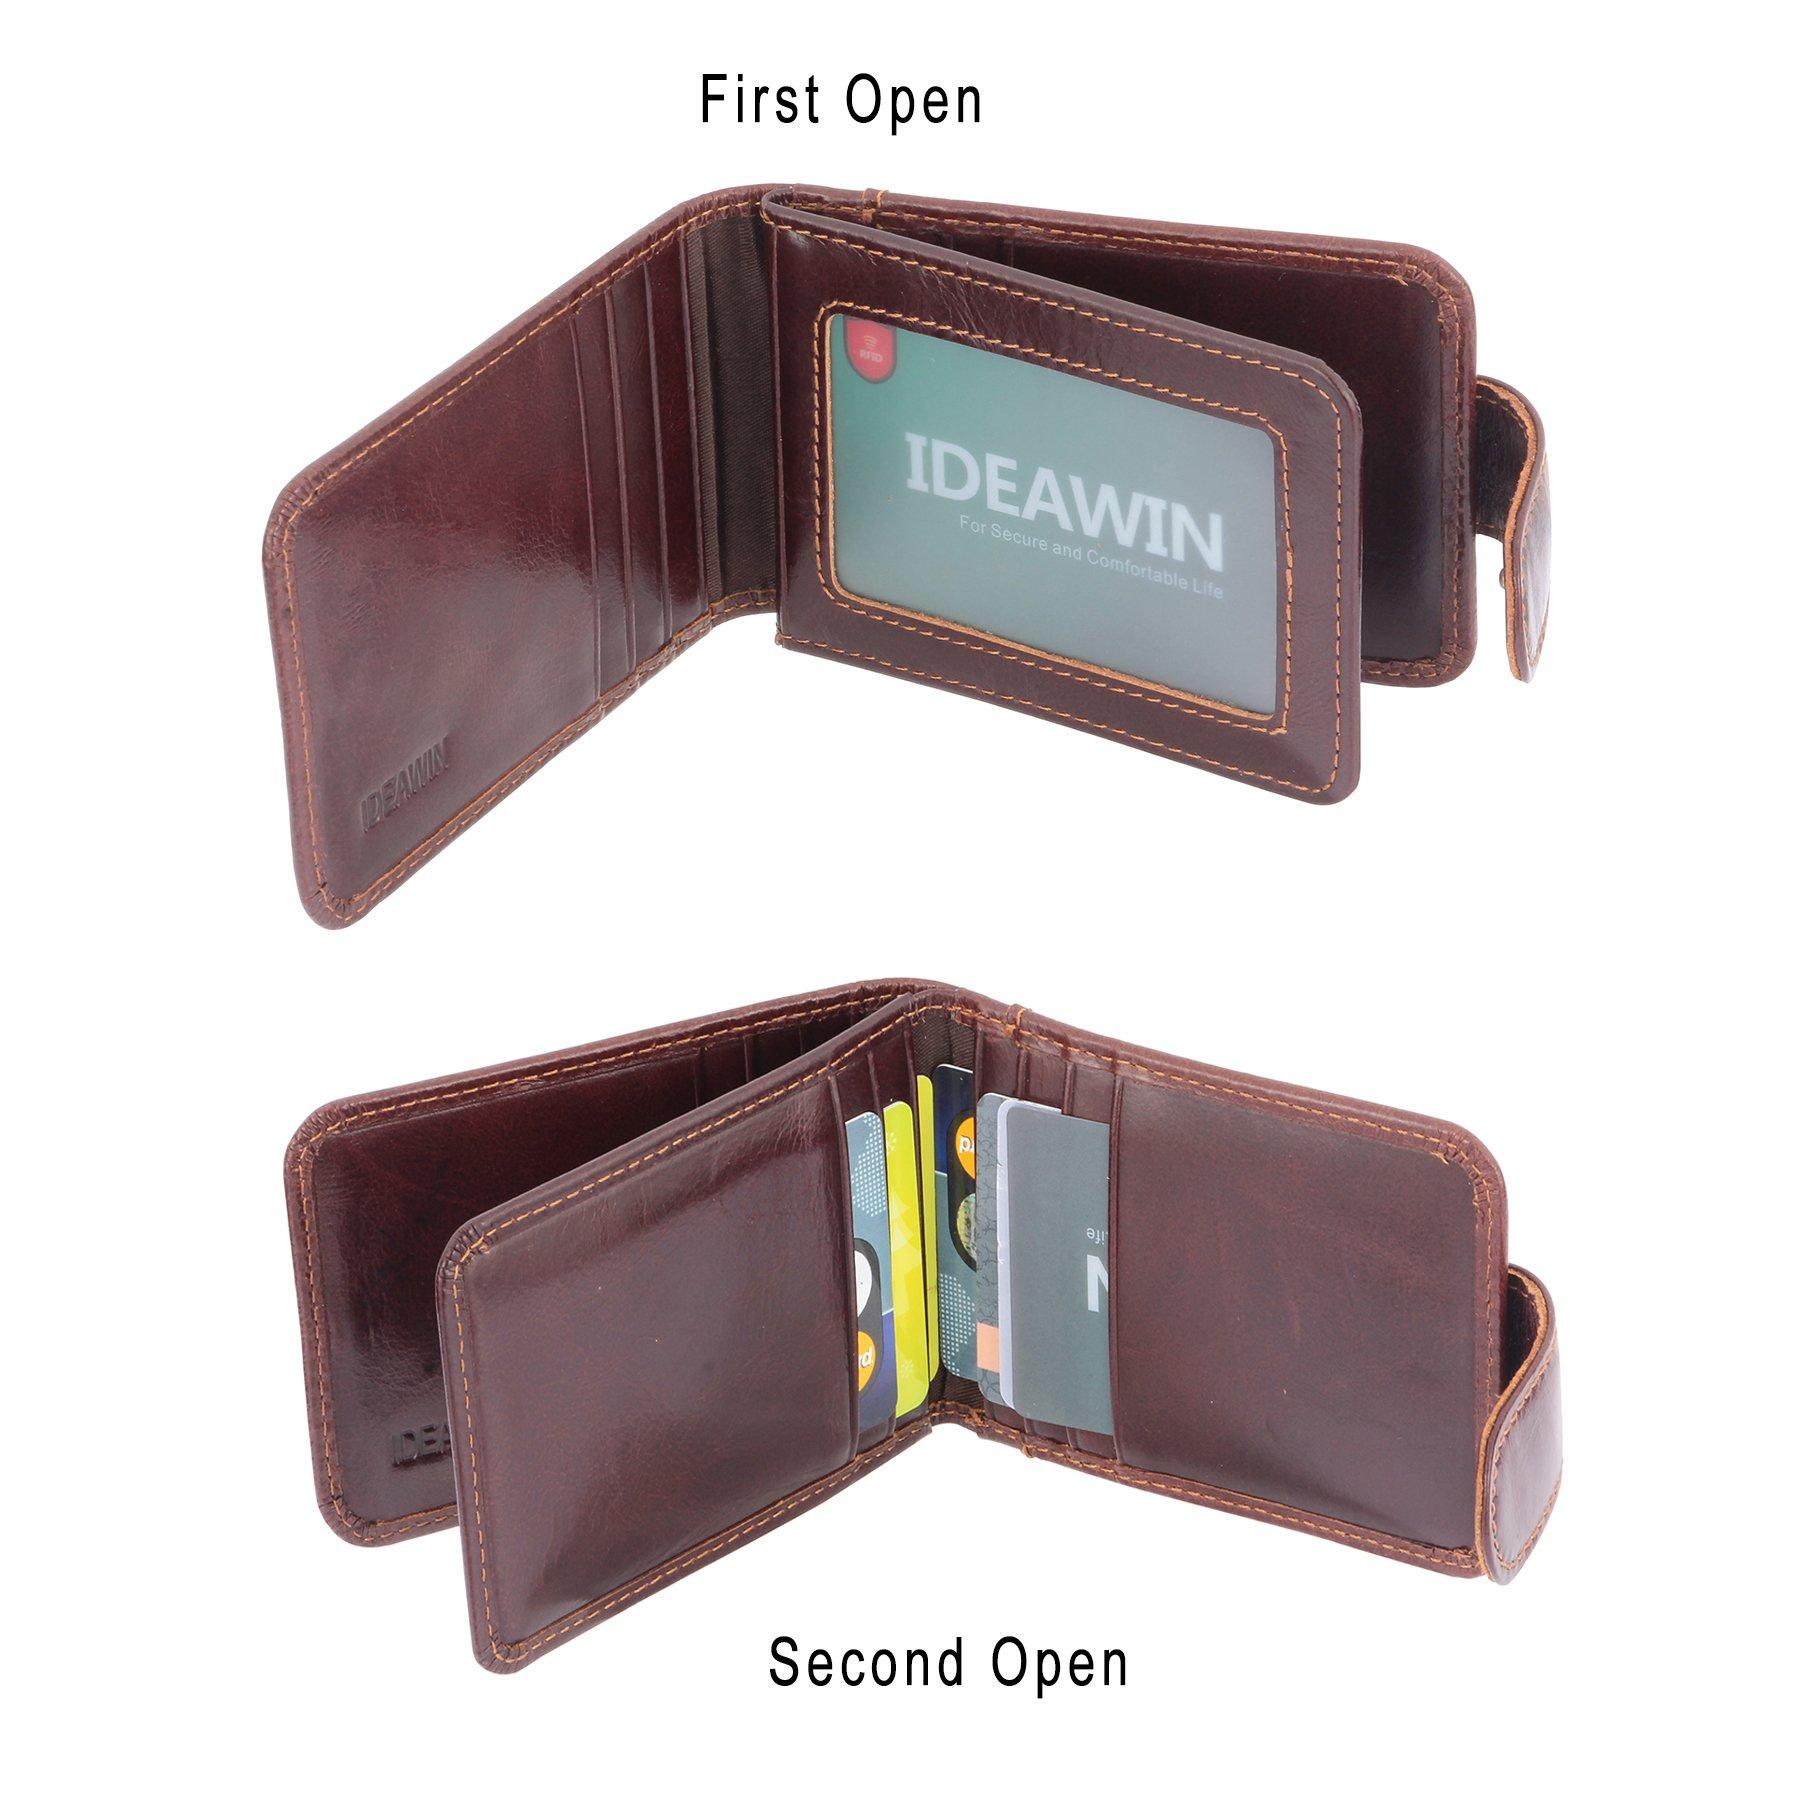 IDEAWIN Genuine Leather RFID Blocking Slim Trifold Front Pocket Wallet Card Wallet Card Holder